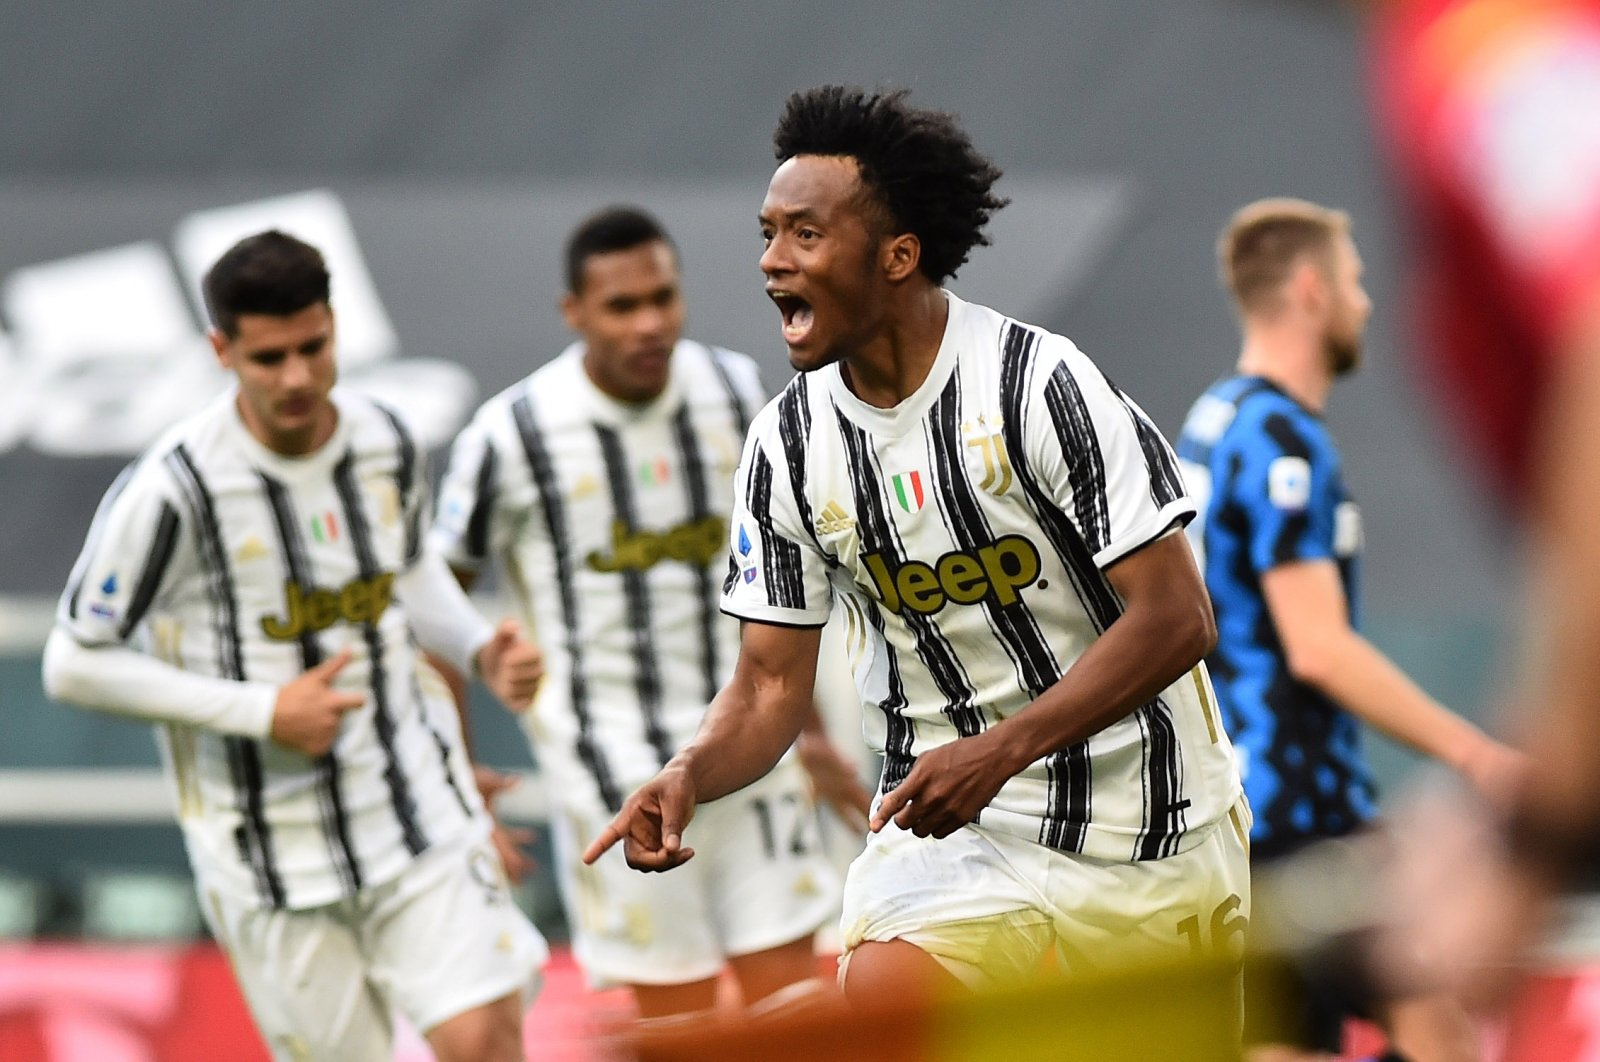 Juventus midfielder Juan Cuadrado celebrates scoring his team's third goal during Serie A match Week 37 match against Inter Milan, at Allianz Stadium, Turin, Italy, May 15, 2021. (Reuters Photo)